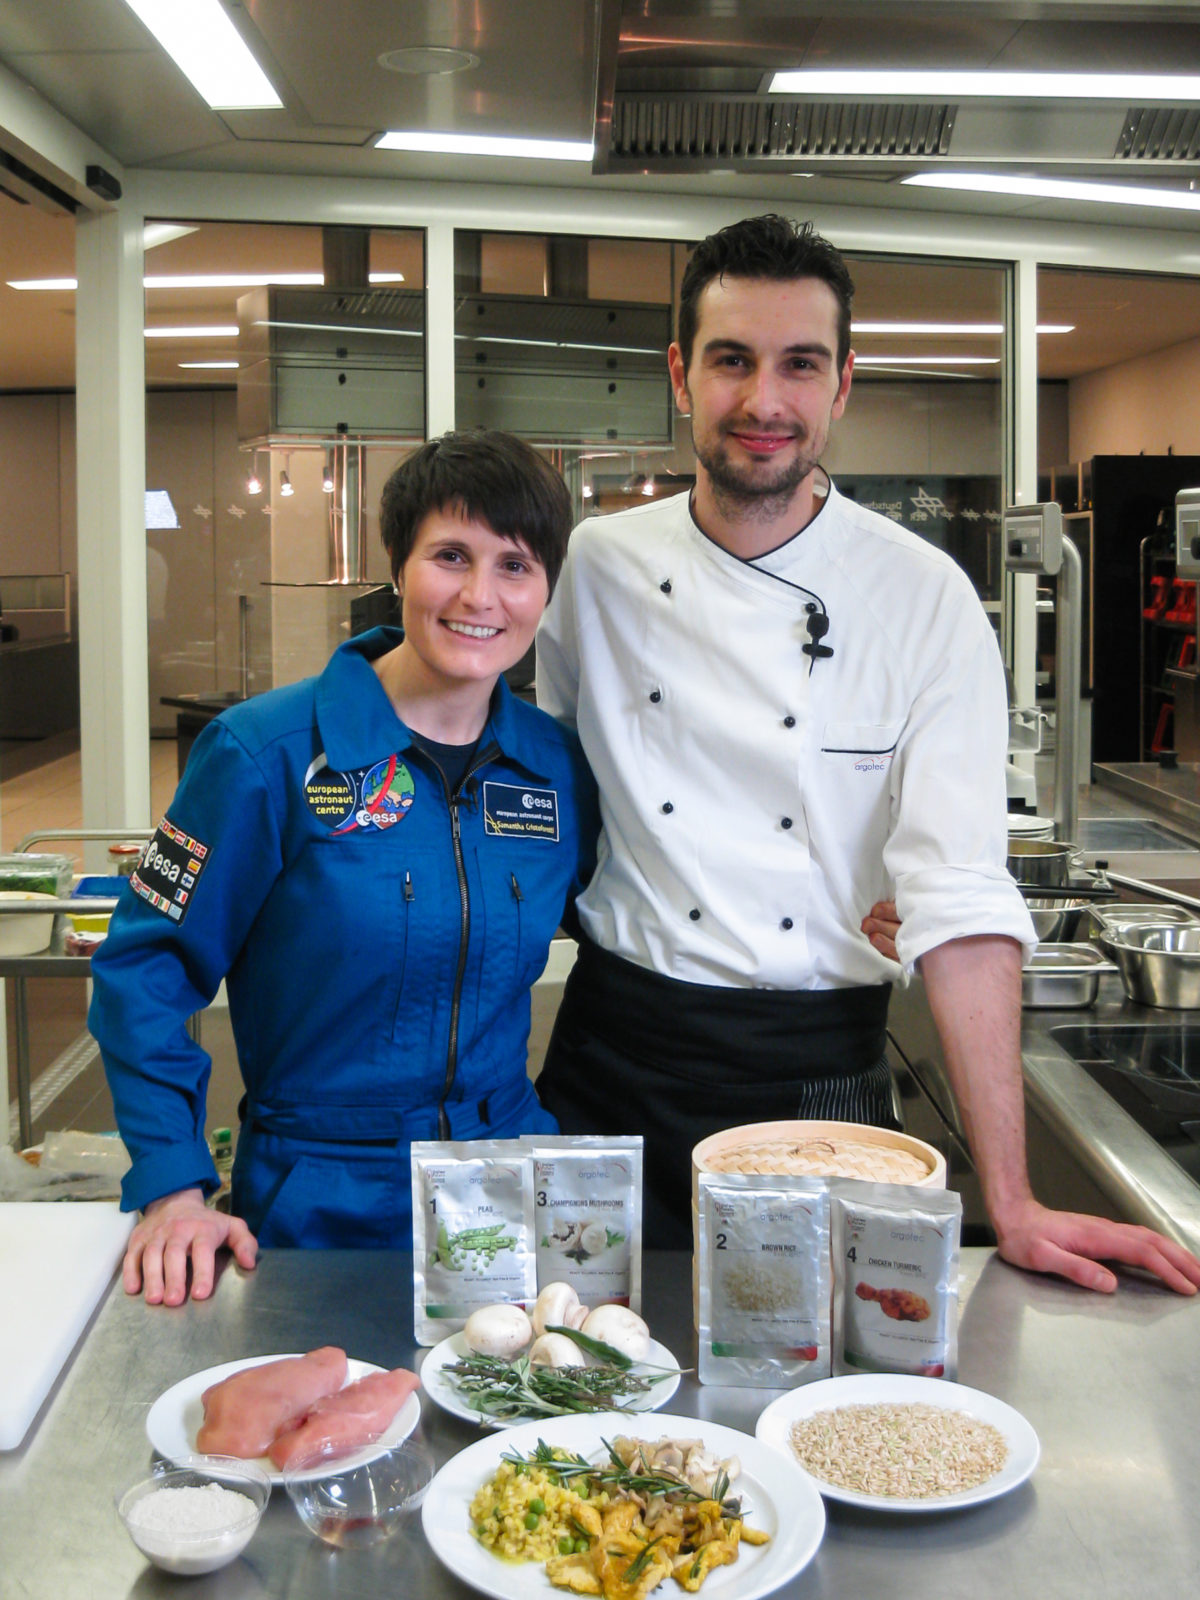 Argrotec - Spacefood - Samantha Cristoforetti | Dotmug